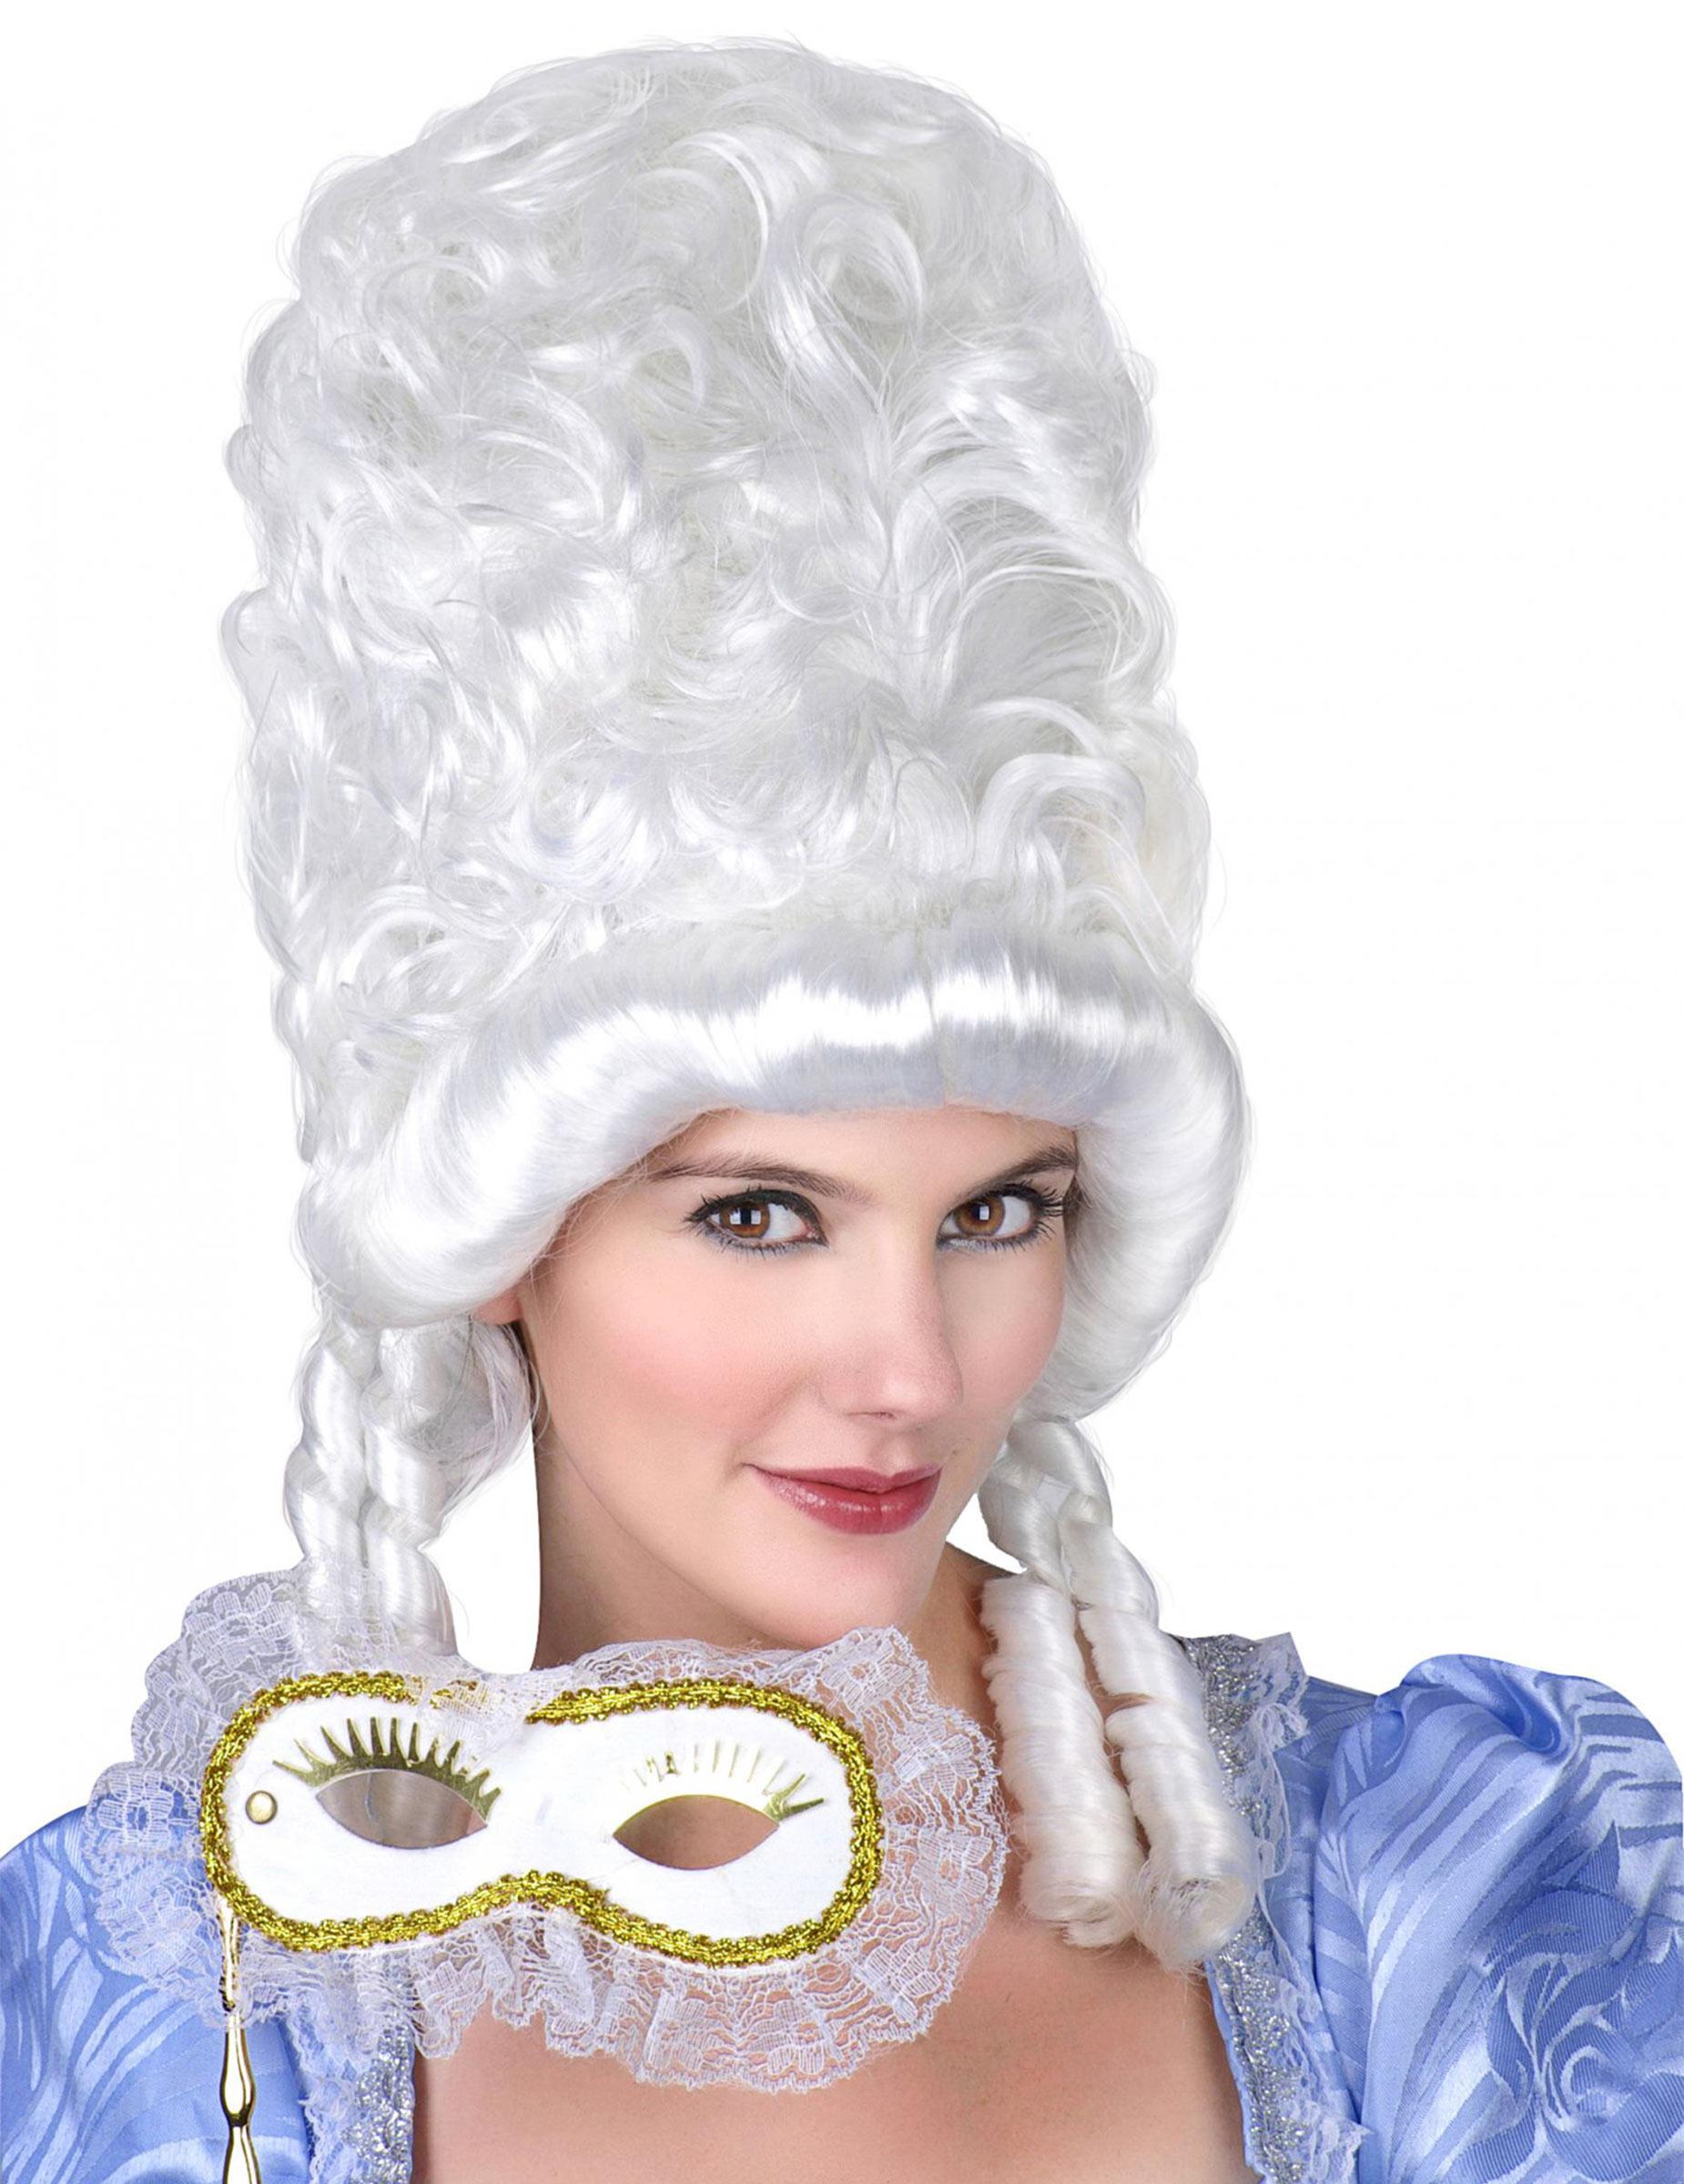 Prinzessinnen Perücke barock weiß 46088